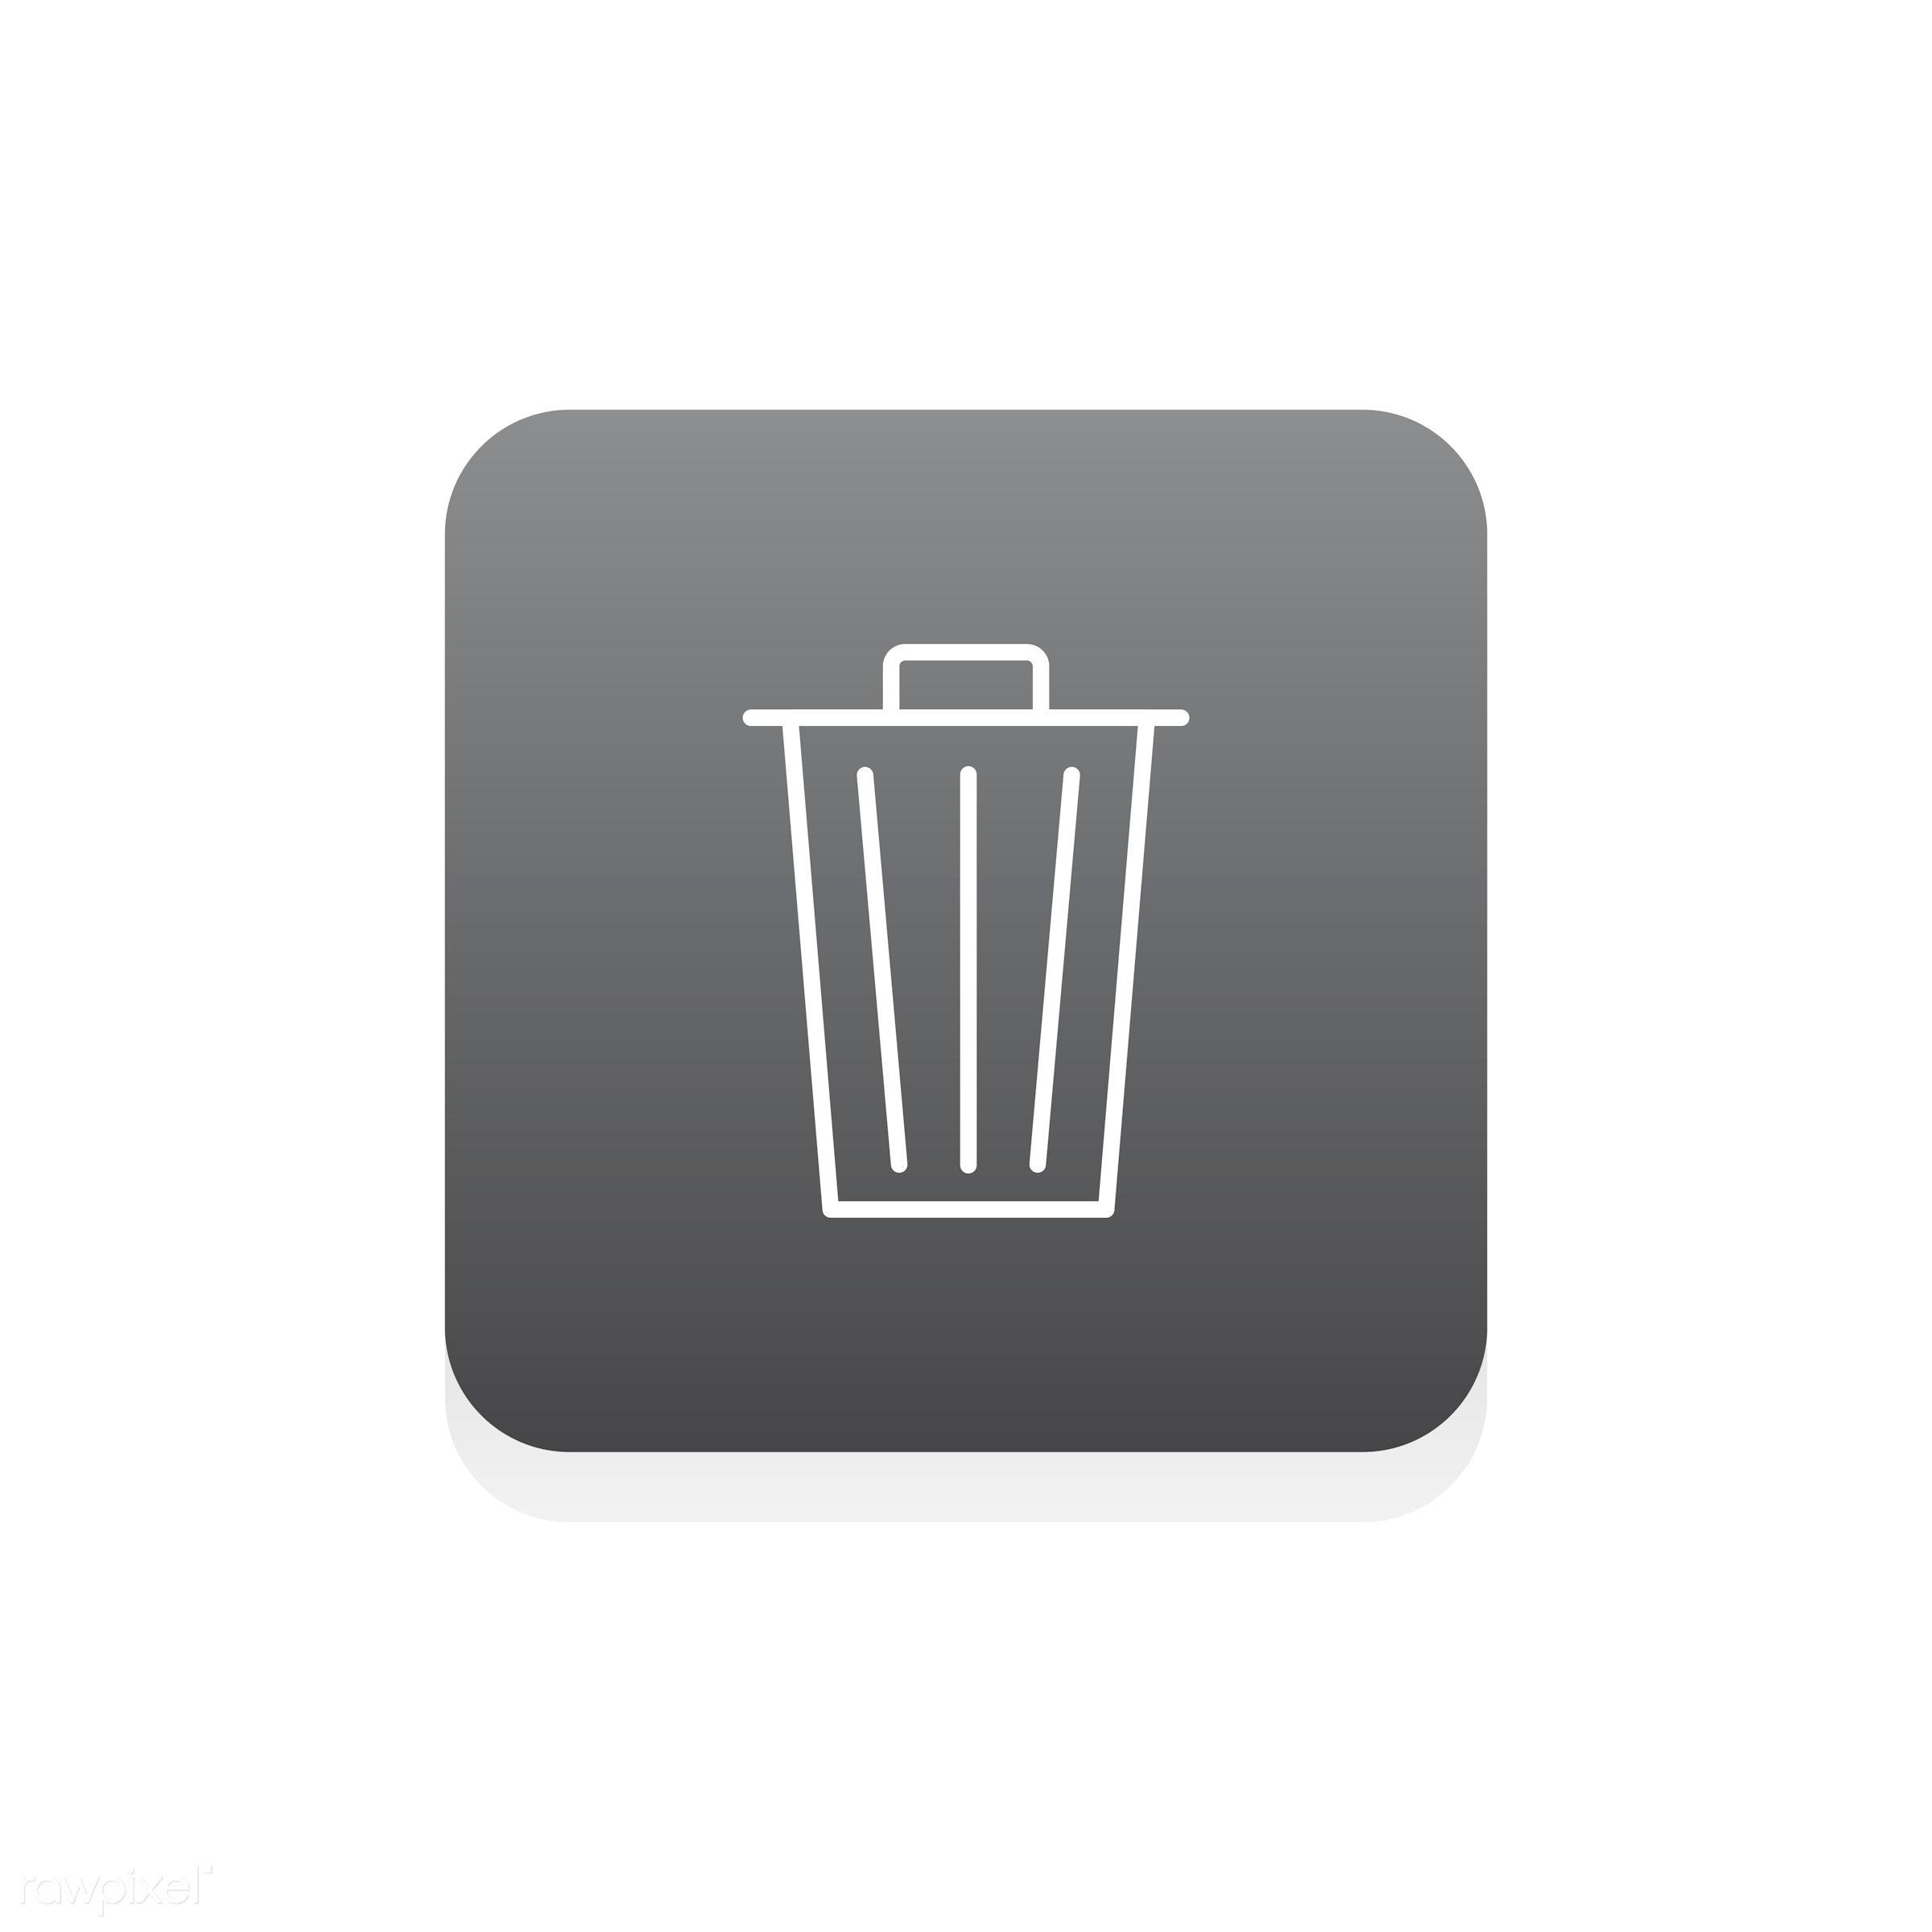 Vector of delete icon - bin, delete, design, flat, graphic, icon, illustration, isolated, junk, layout, style, symbol, trash...